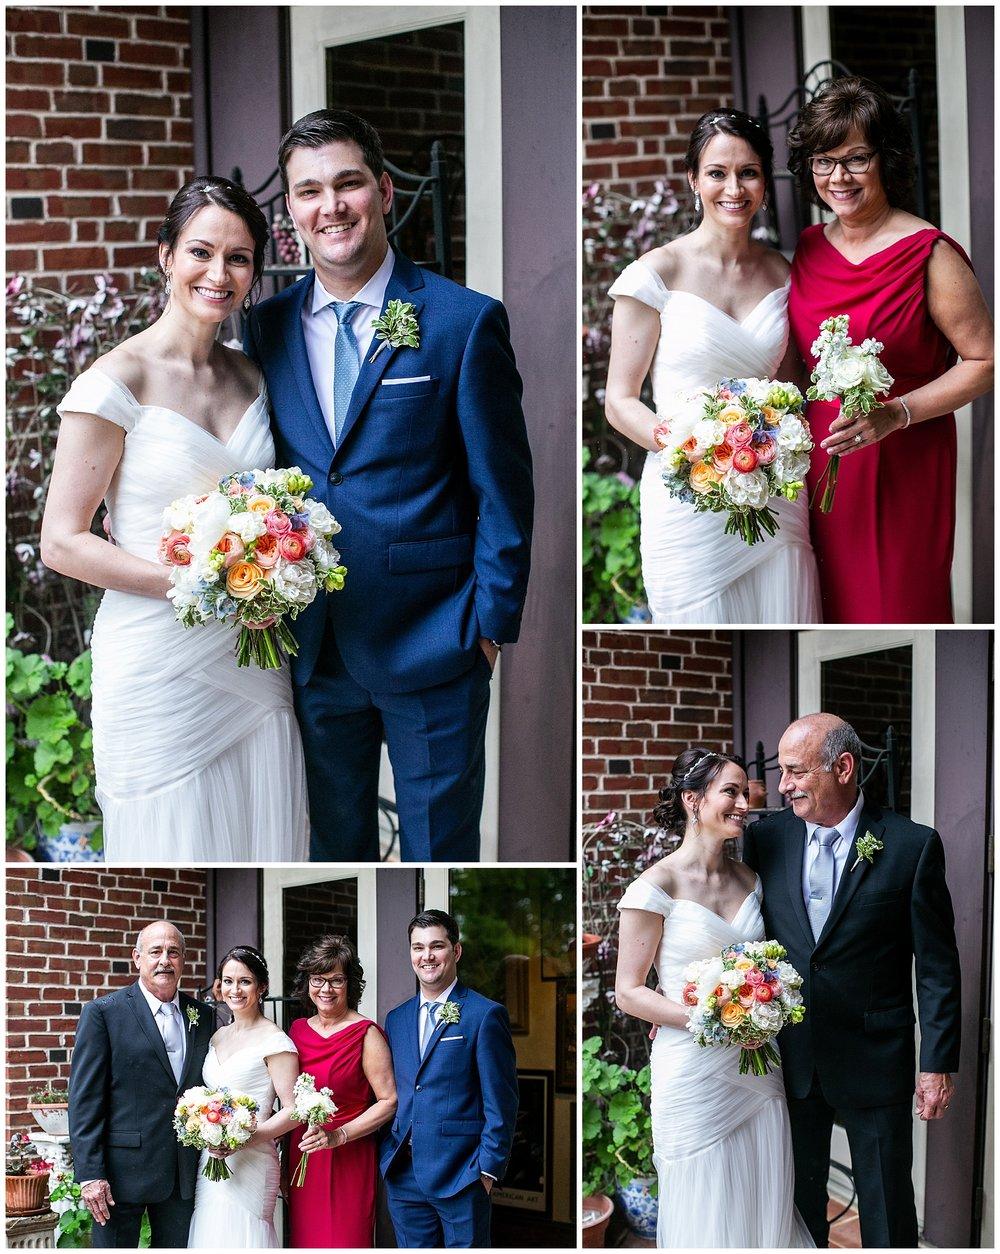 Ashley + Kevin Gramercy Mansion Rainy Day Baltimore Wedding Living Radiant Photography photos_0061.jpg